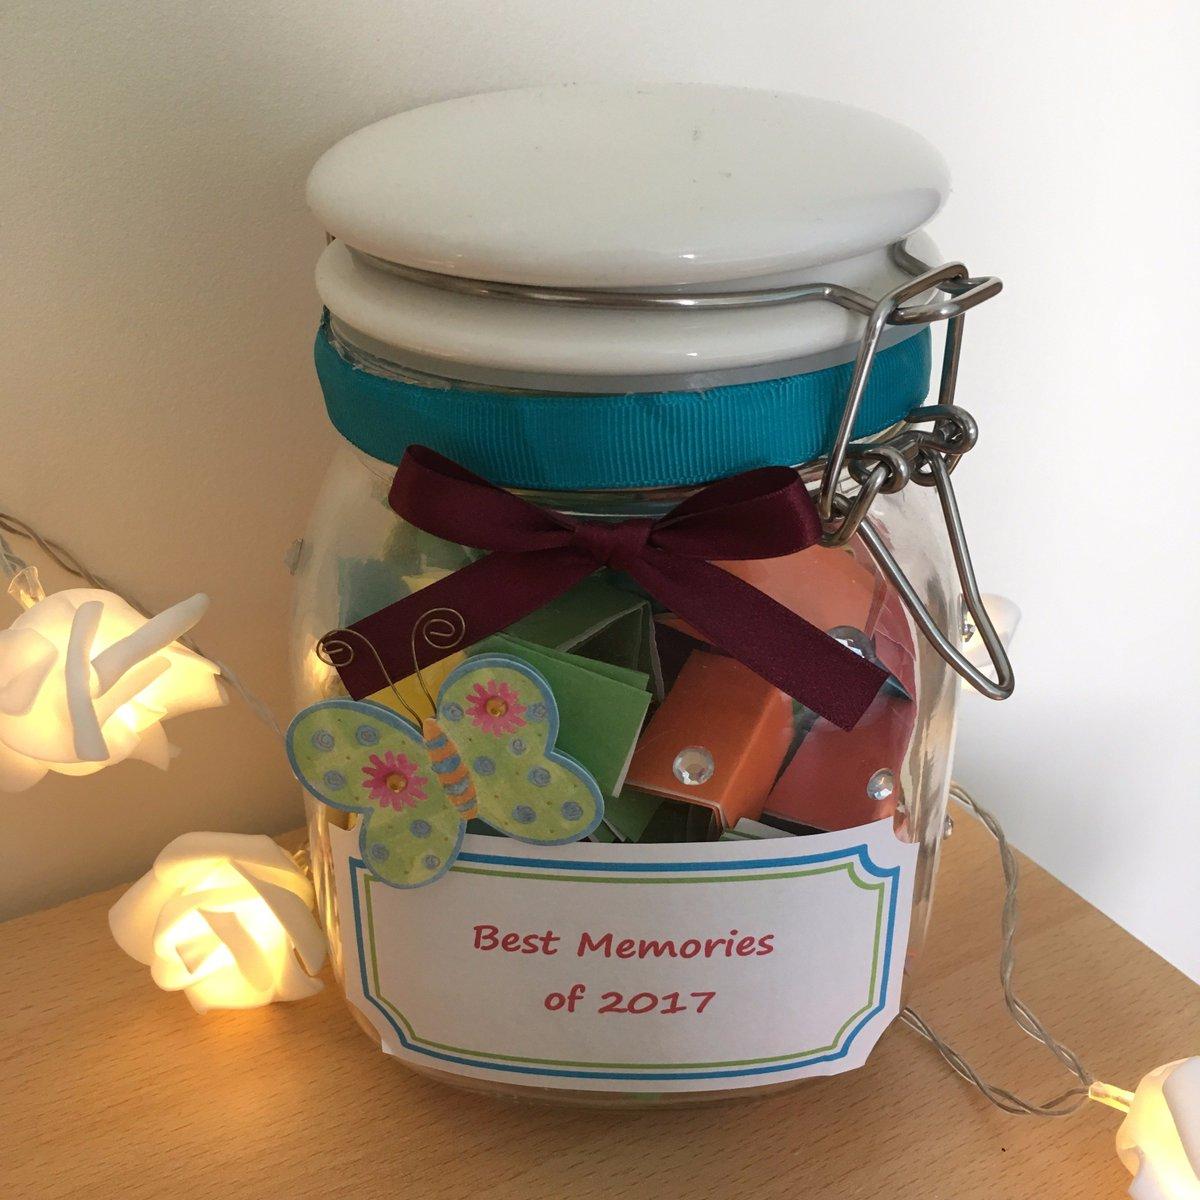 Memory Jar! -  http:// aboxofbuttons.wordpress.com/2017/05/17/mem ory-jar/ &nbsp; …  #aboxofbuttons #wordpress #wordpressblog #diy #diyblogger #blogger #memoryjar #positivethinking #blog<br>http://pic.twitter.com/wsljwEkvaw